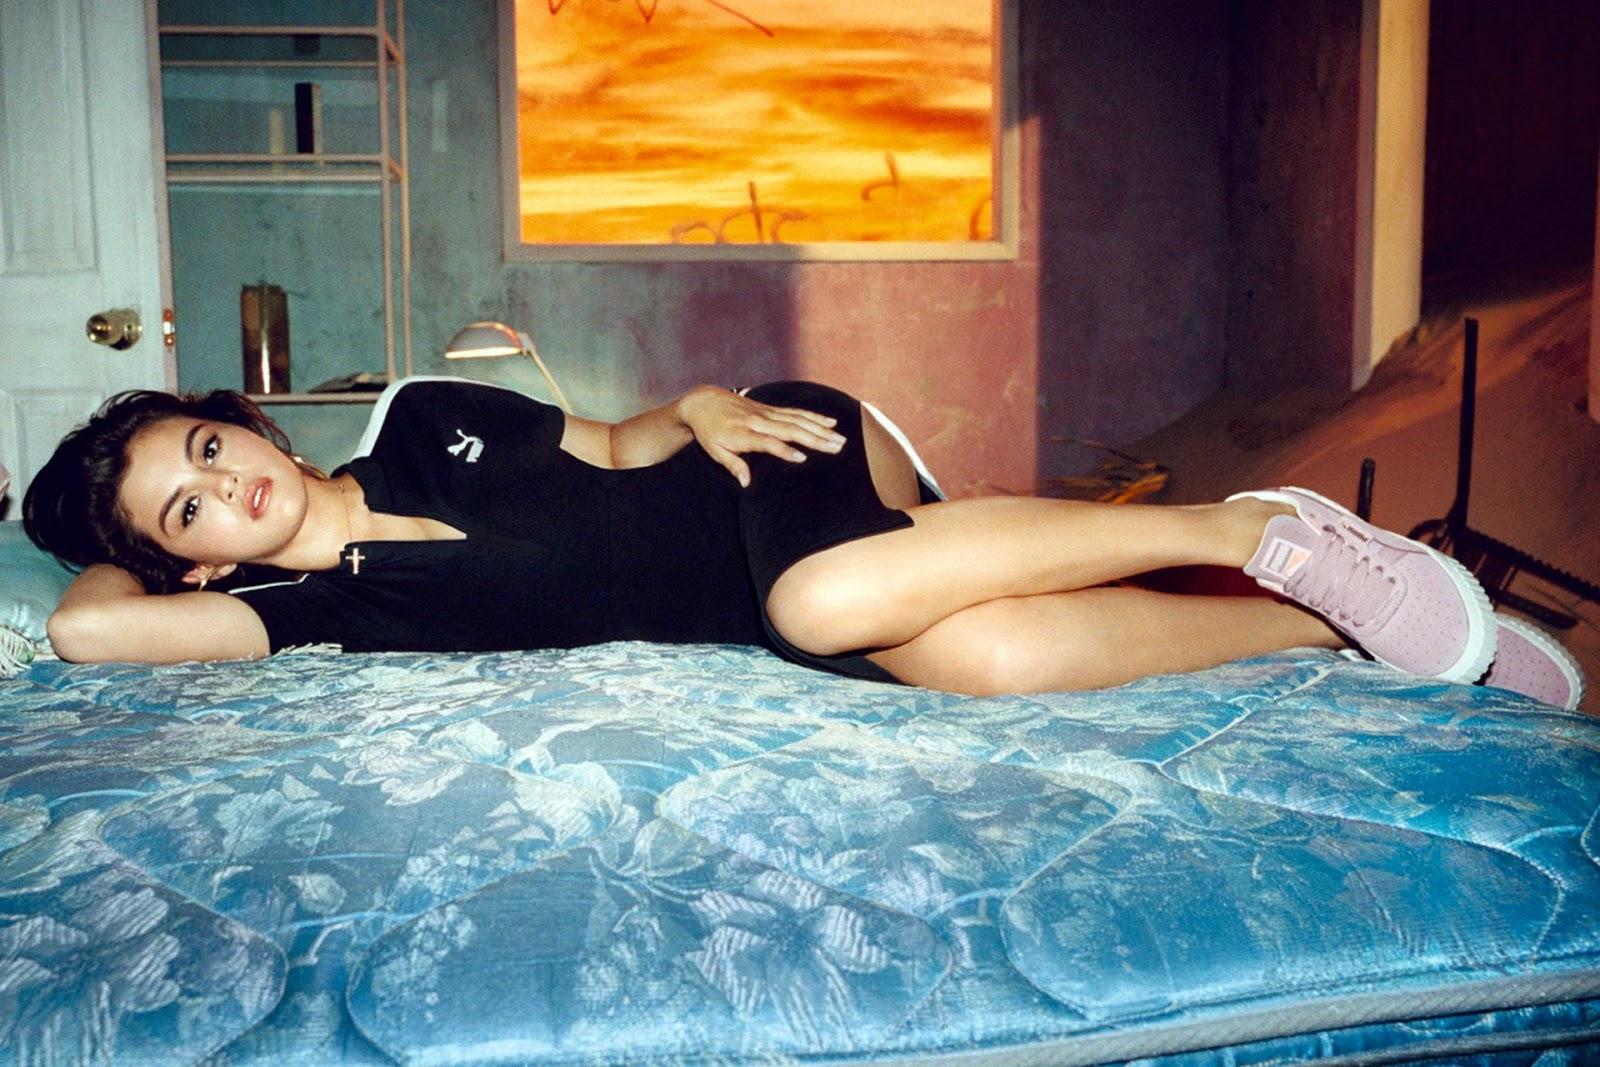 PUMA Cali Nubuck Campaign featuring Selena Gomez